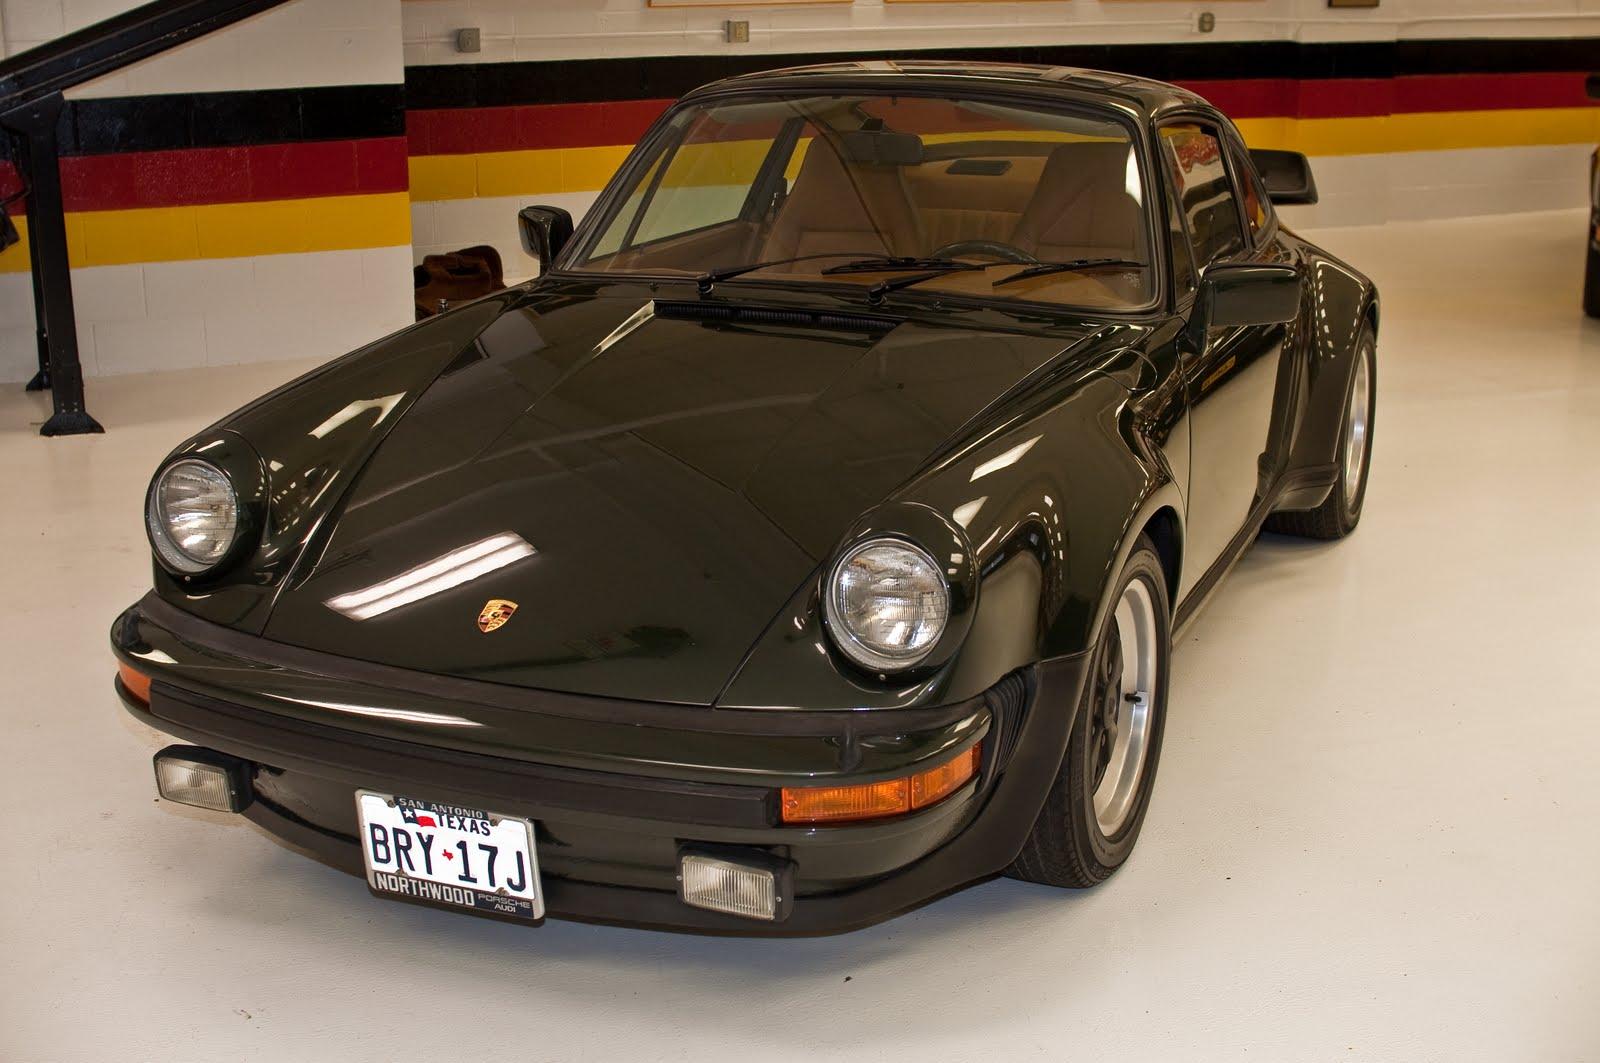 Renn-Spot: '79 Porsche 911 Turbo For Sale - 9,868 Original Miles!